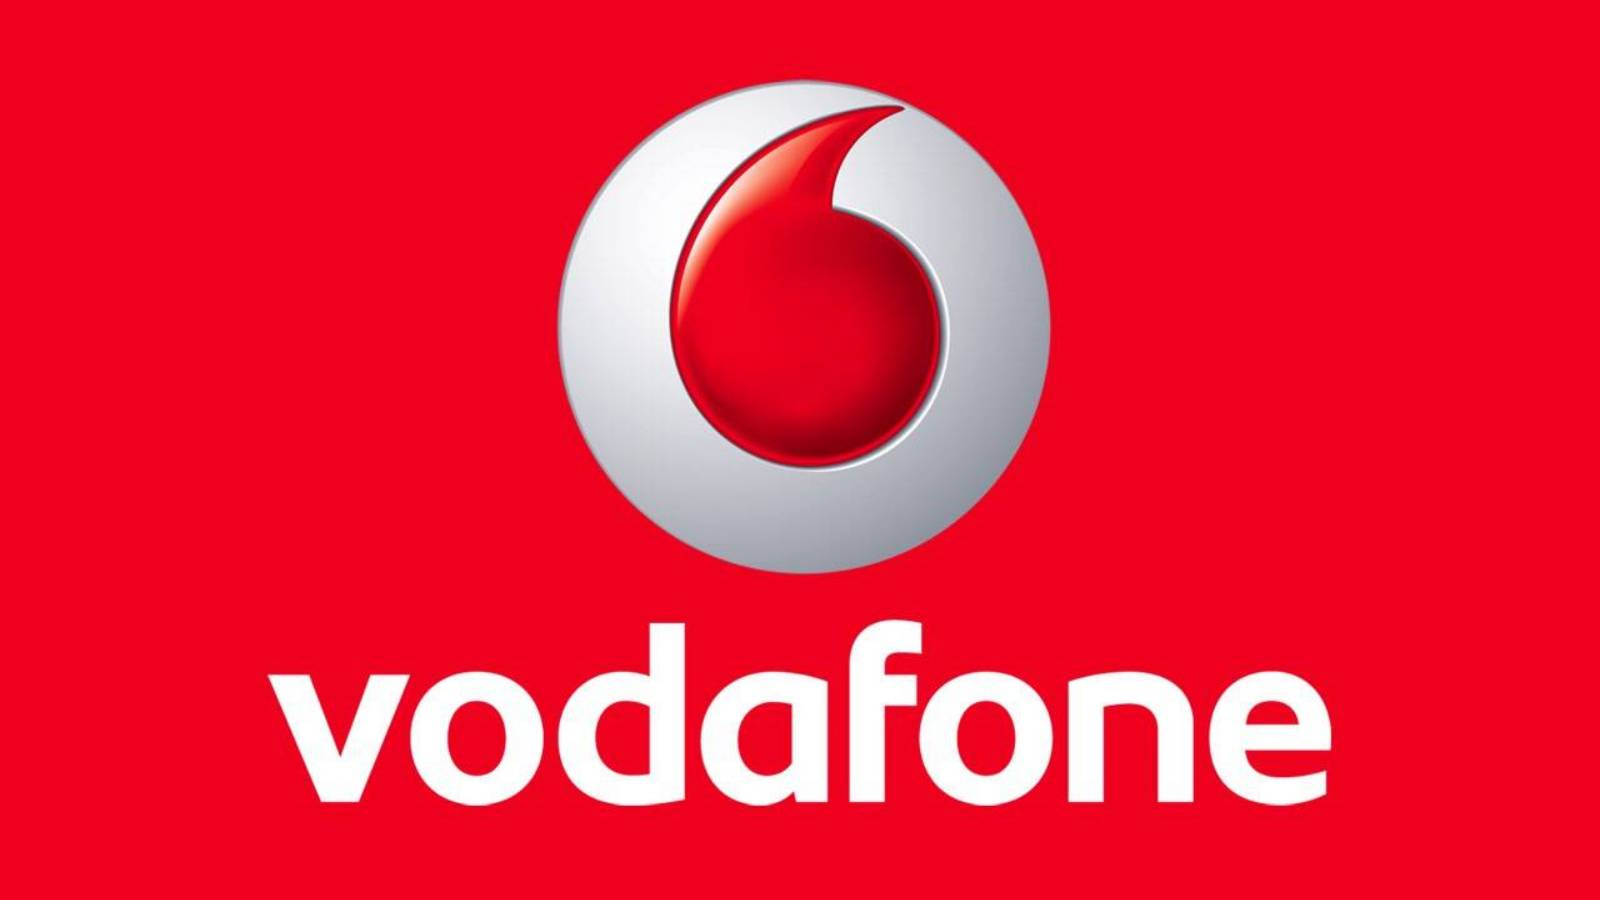 Vodafone pachet